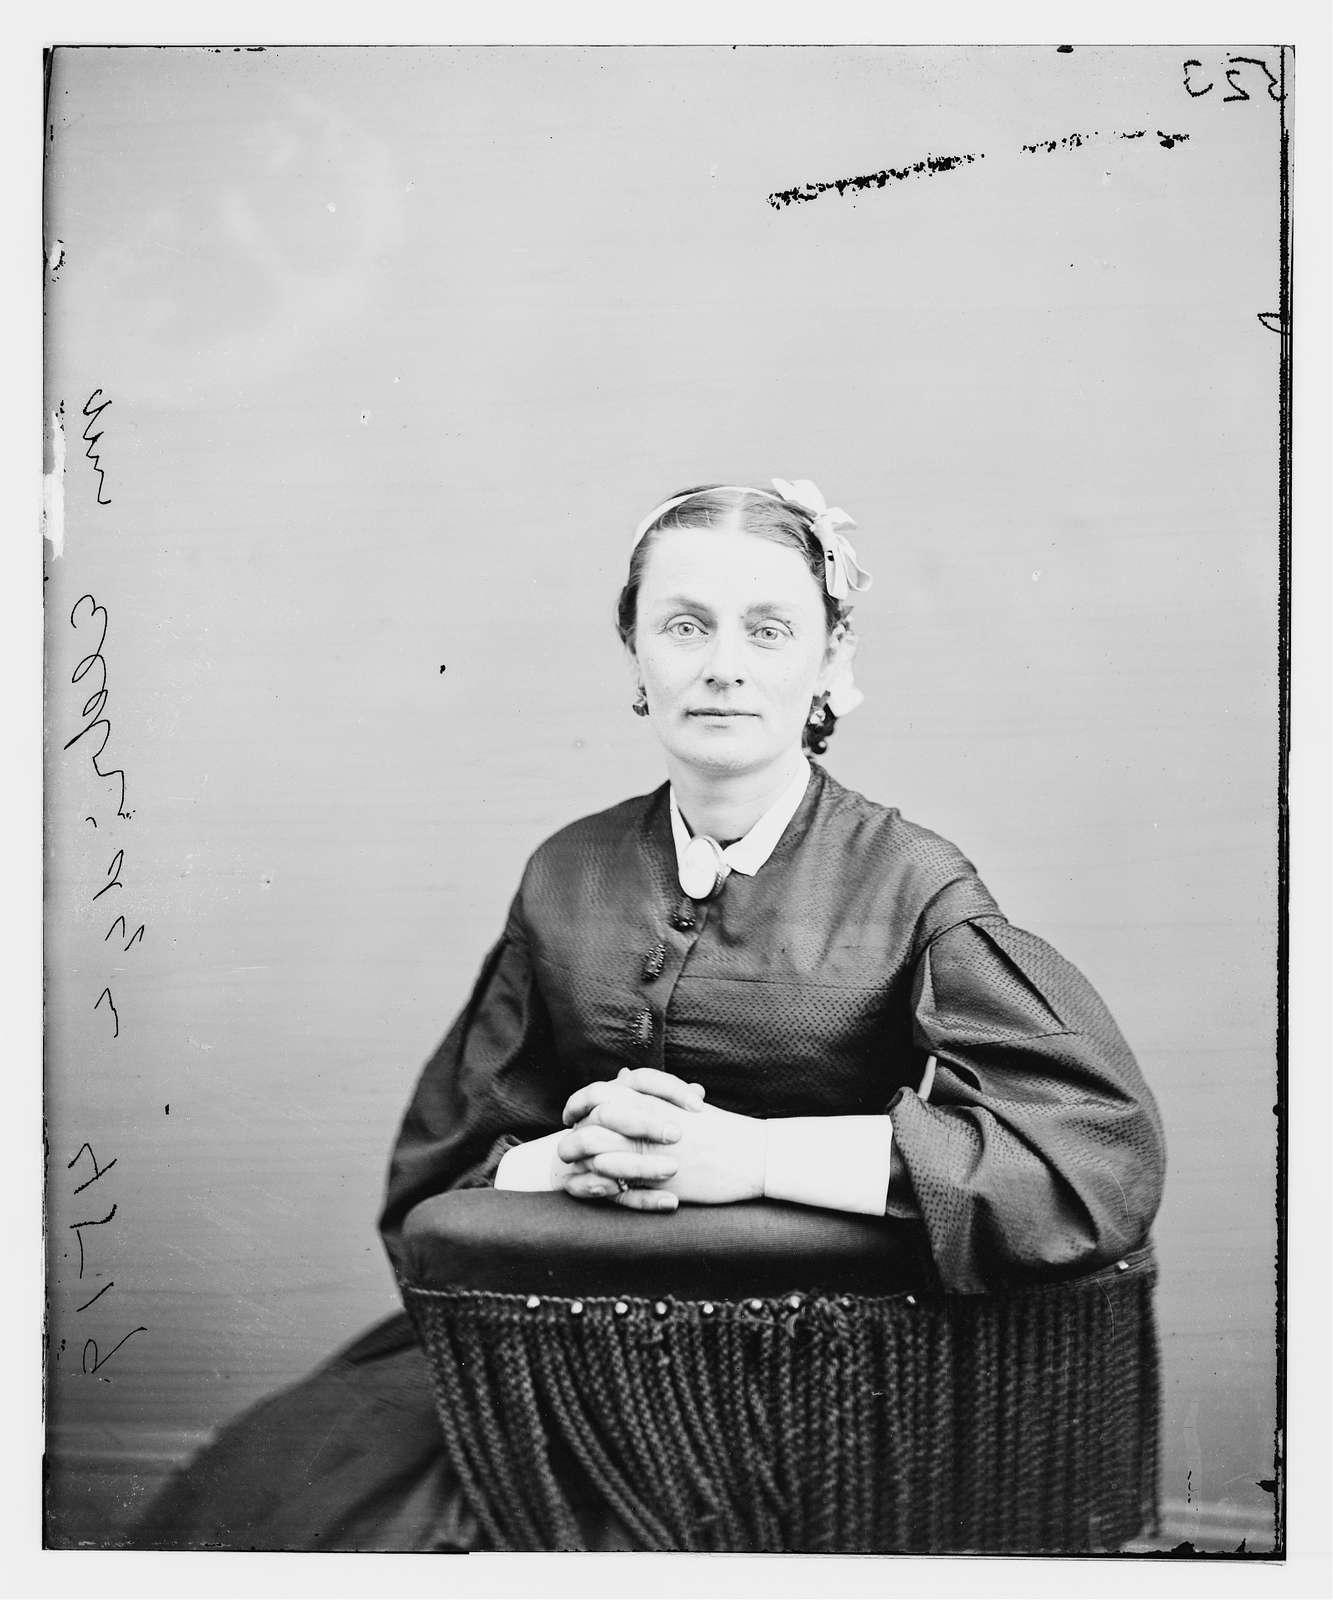 Mrs. Eldridge